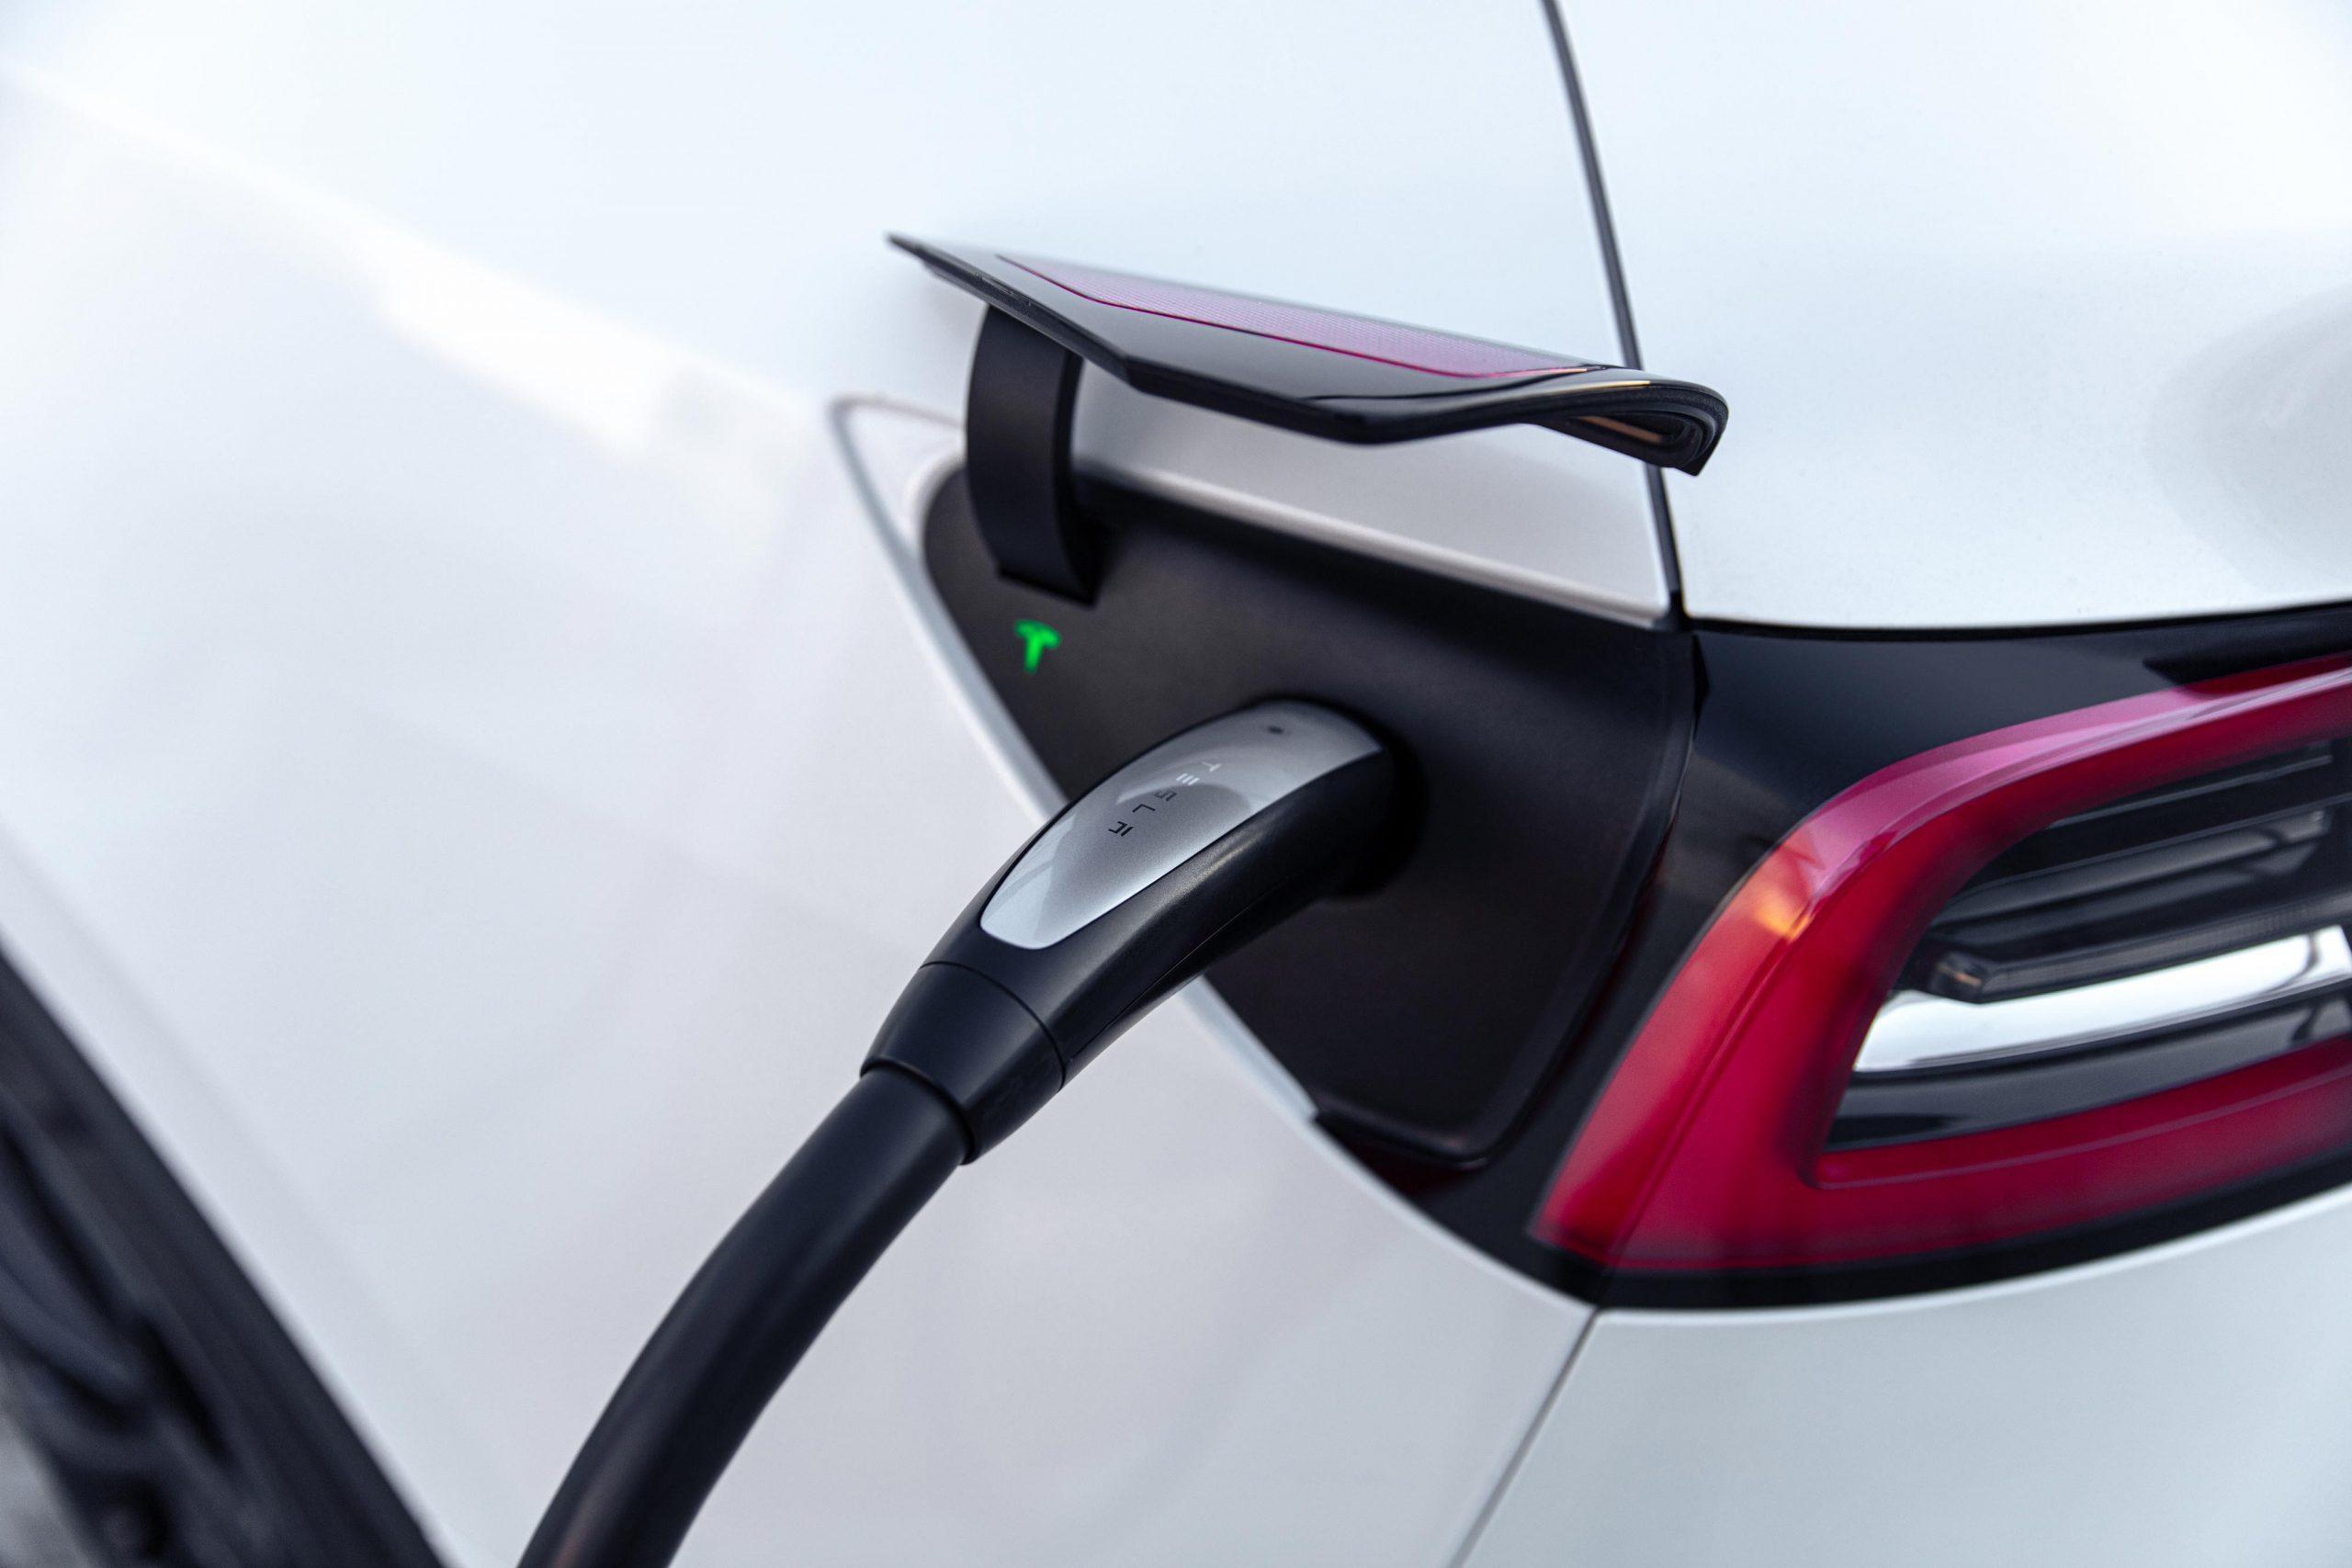 Tesla brings CCS adapter to Korean market, intends North American launch soon